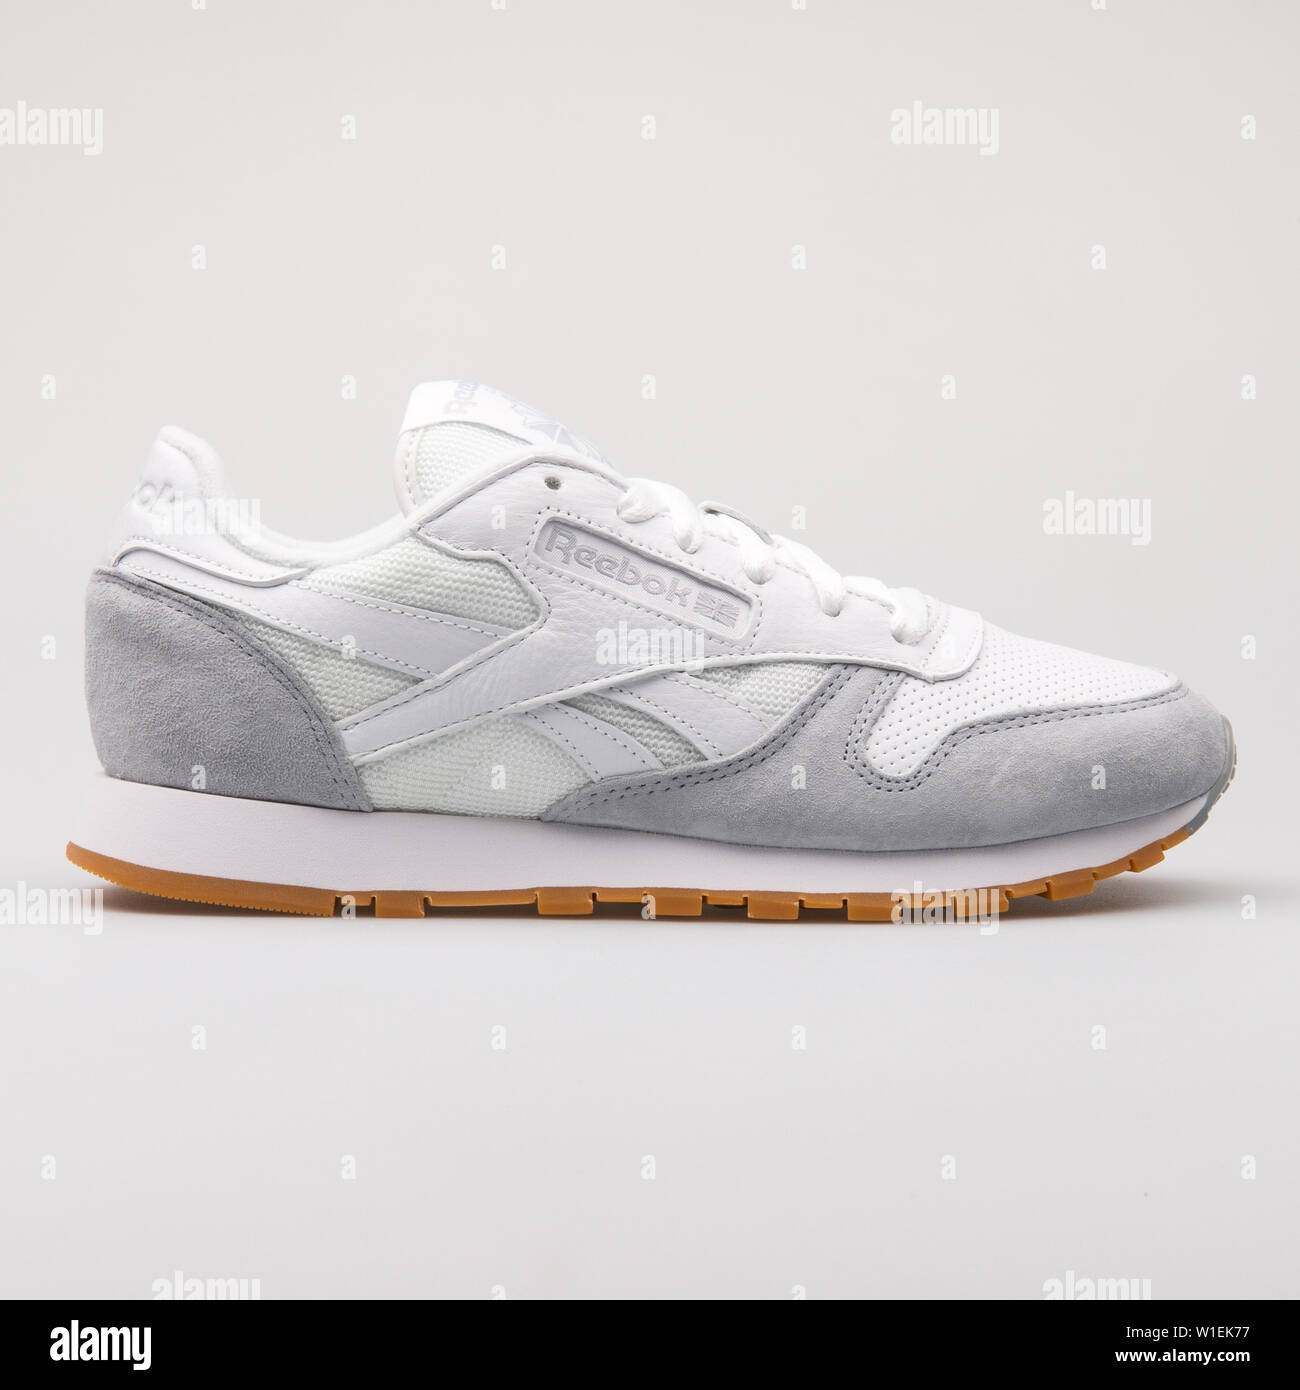 reebok classic gris y blanco